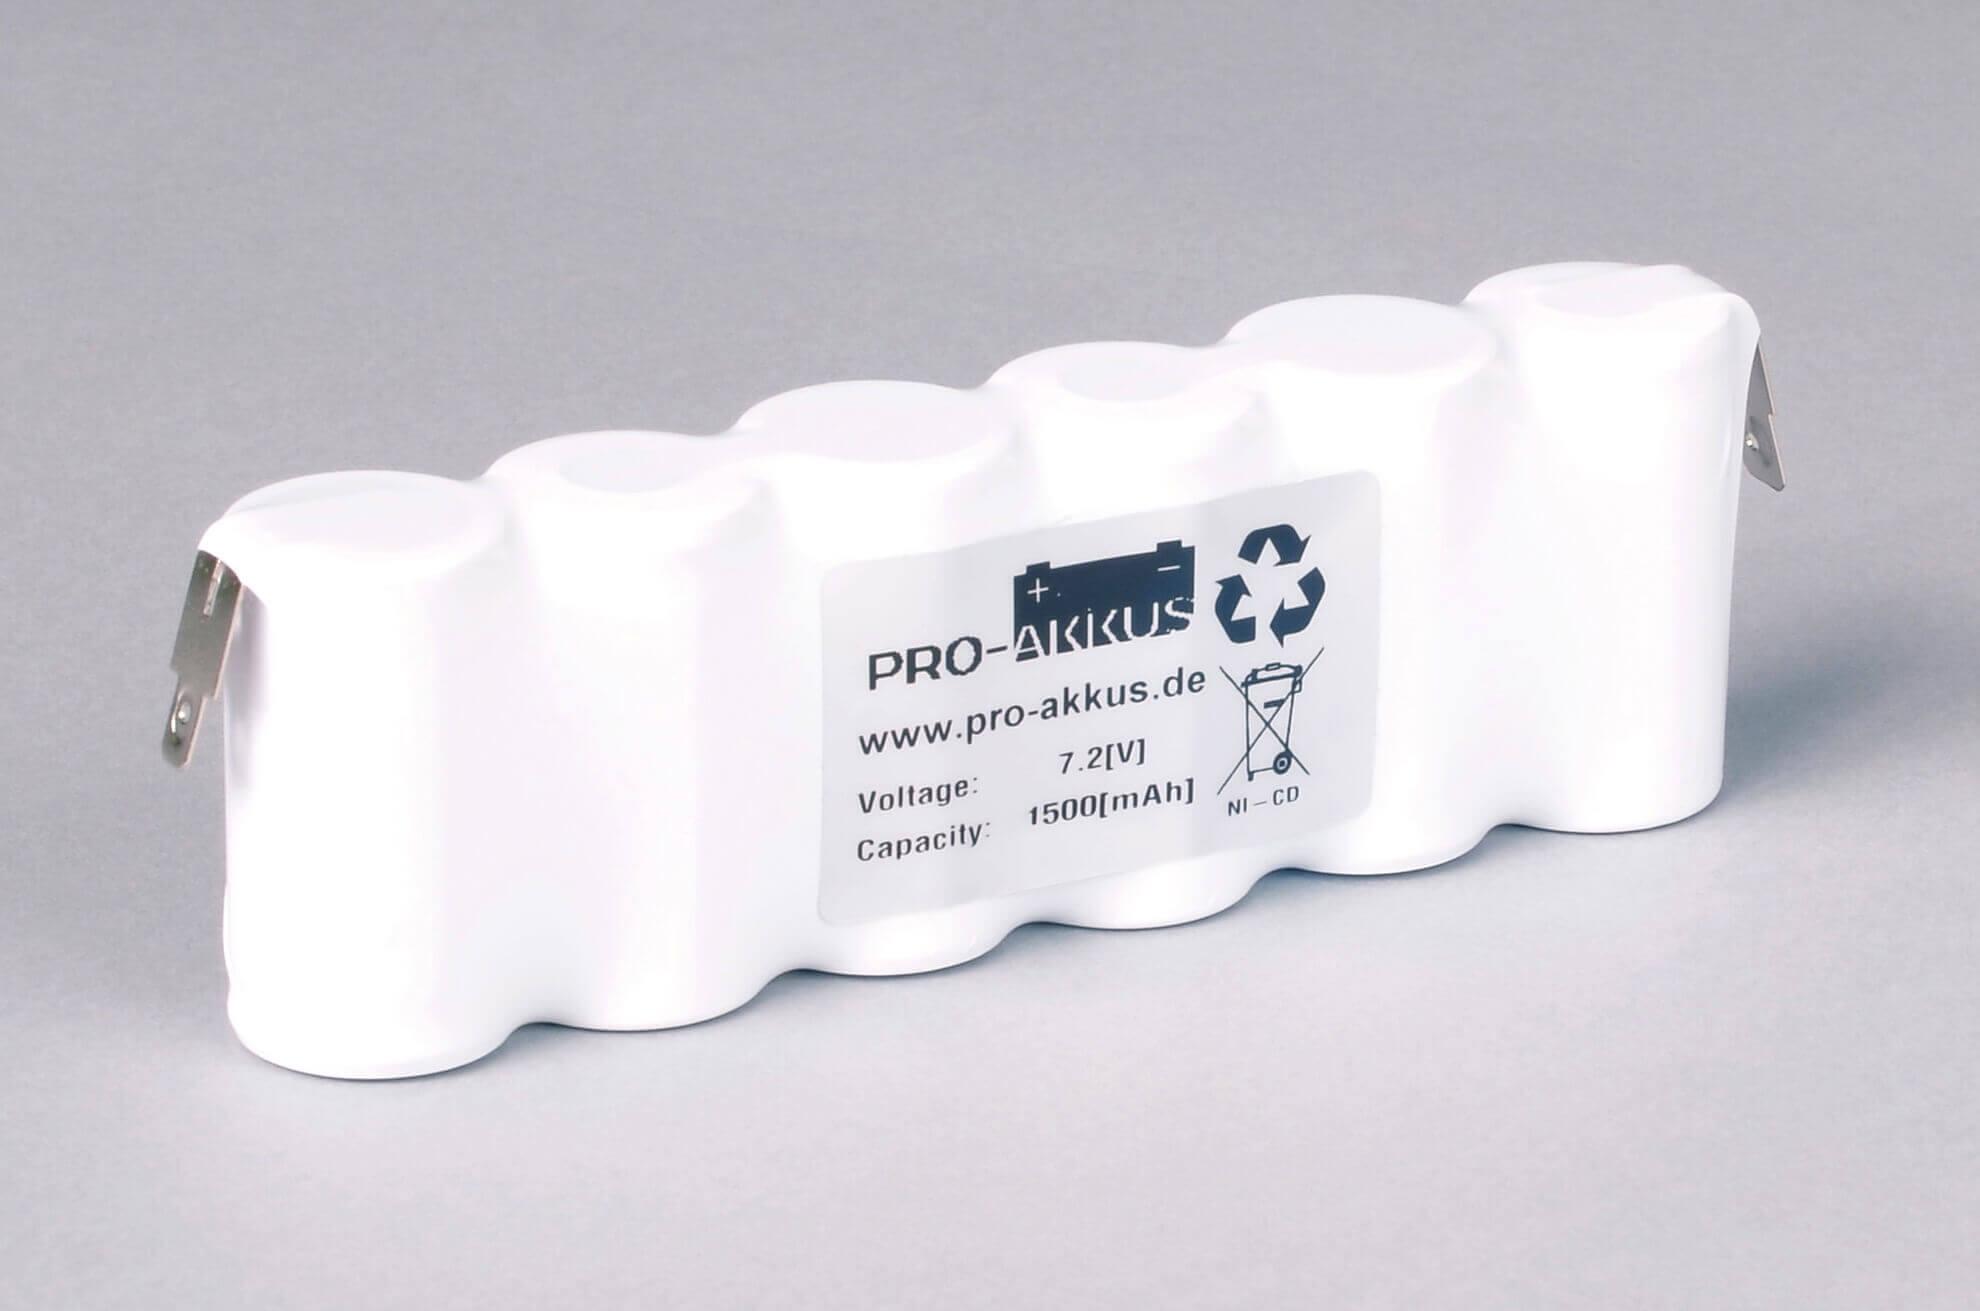 Ni-Cd Akkupack Notlicht Notbeleuchtung 7,2V / 1500mAh (1,5Ah) F6x1 Reihe, Faston Anschlüsse